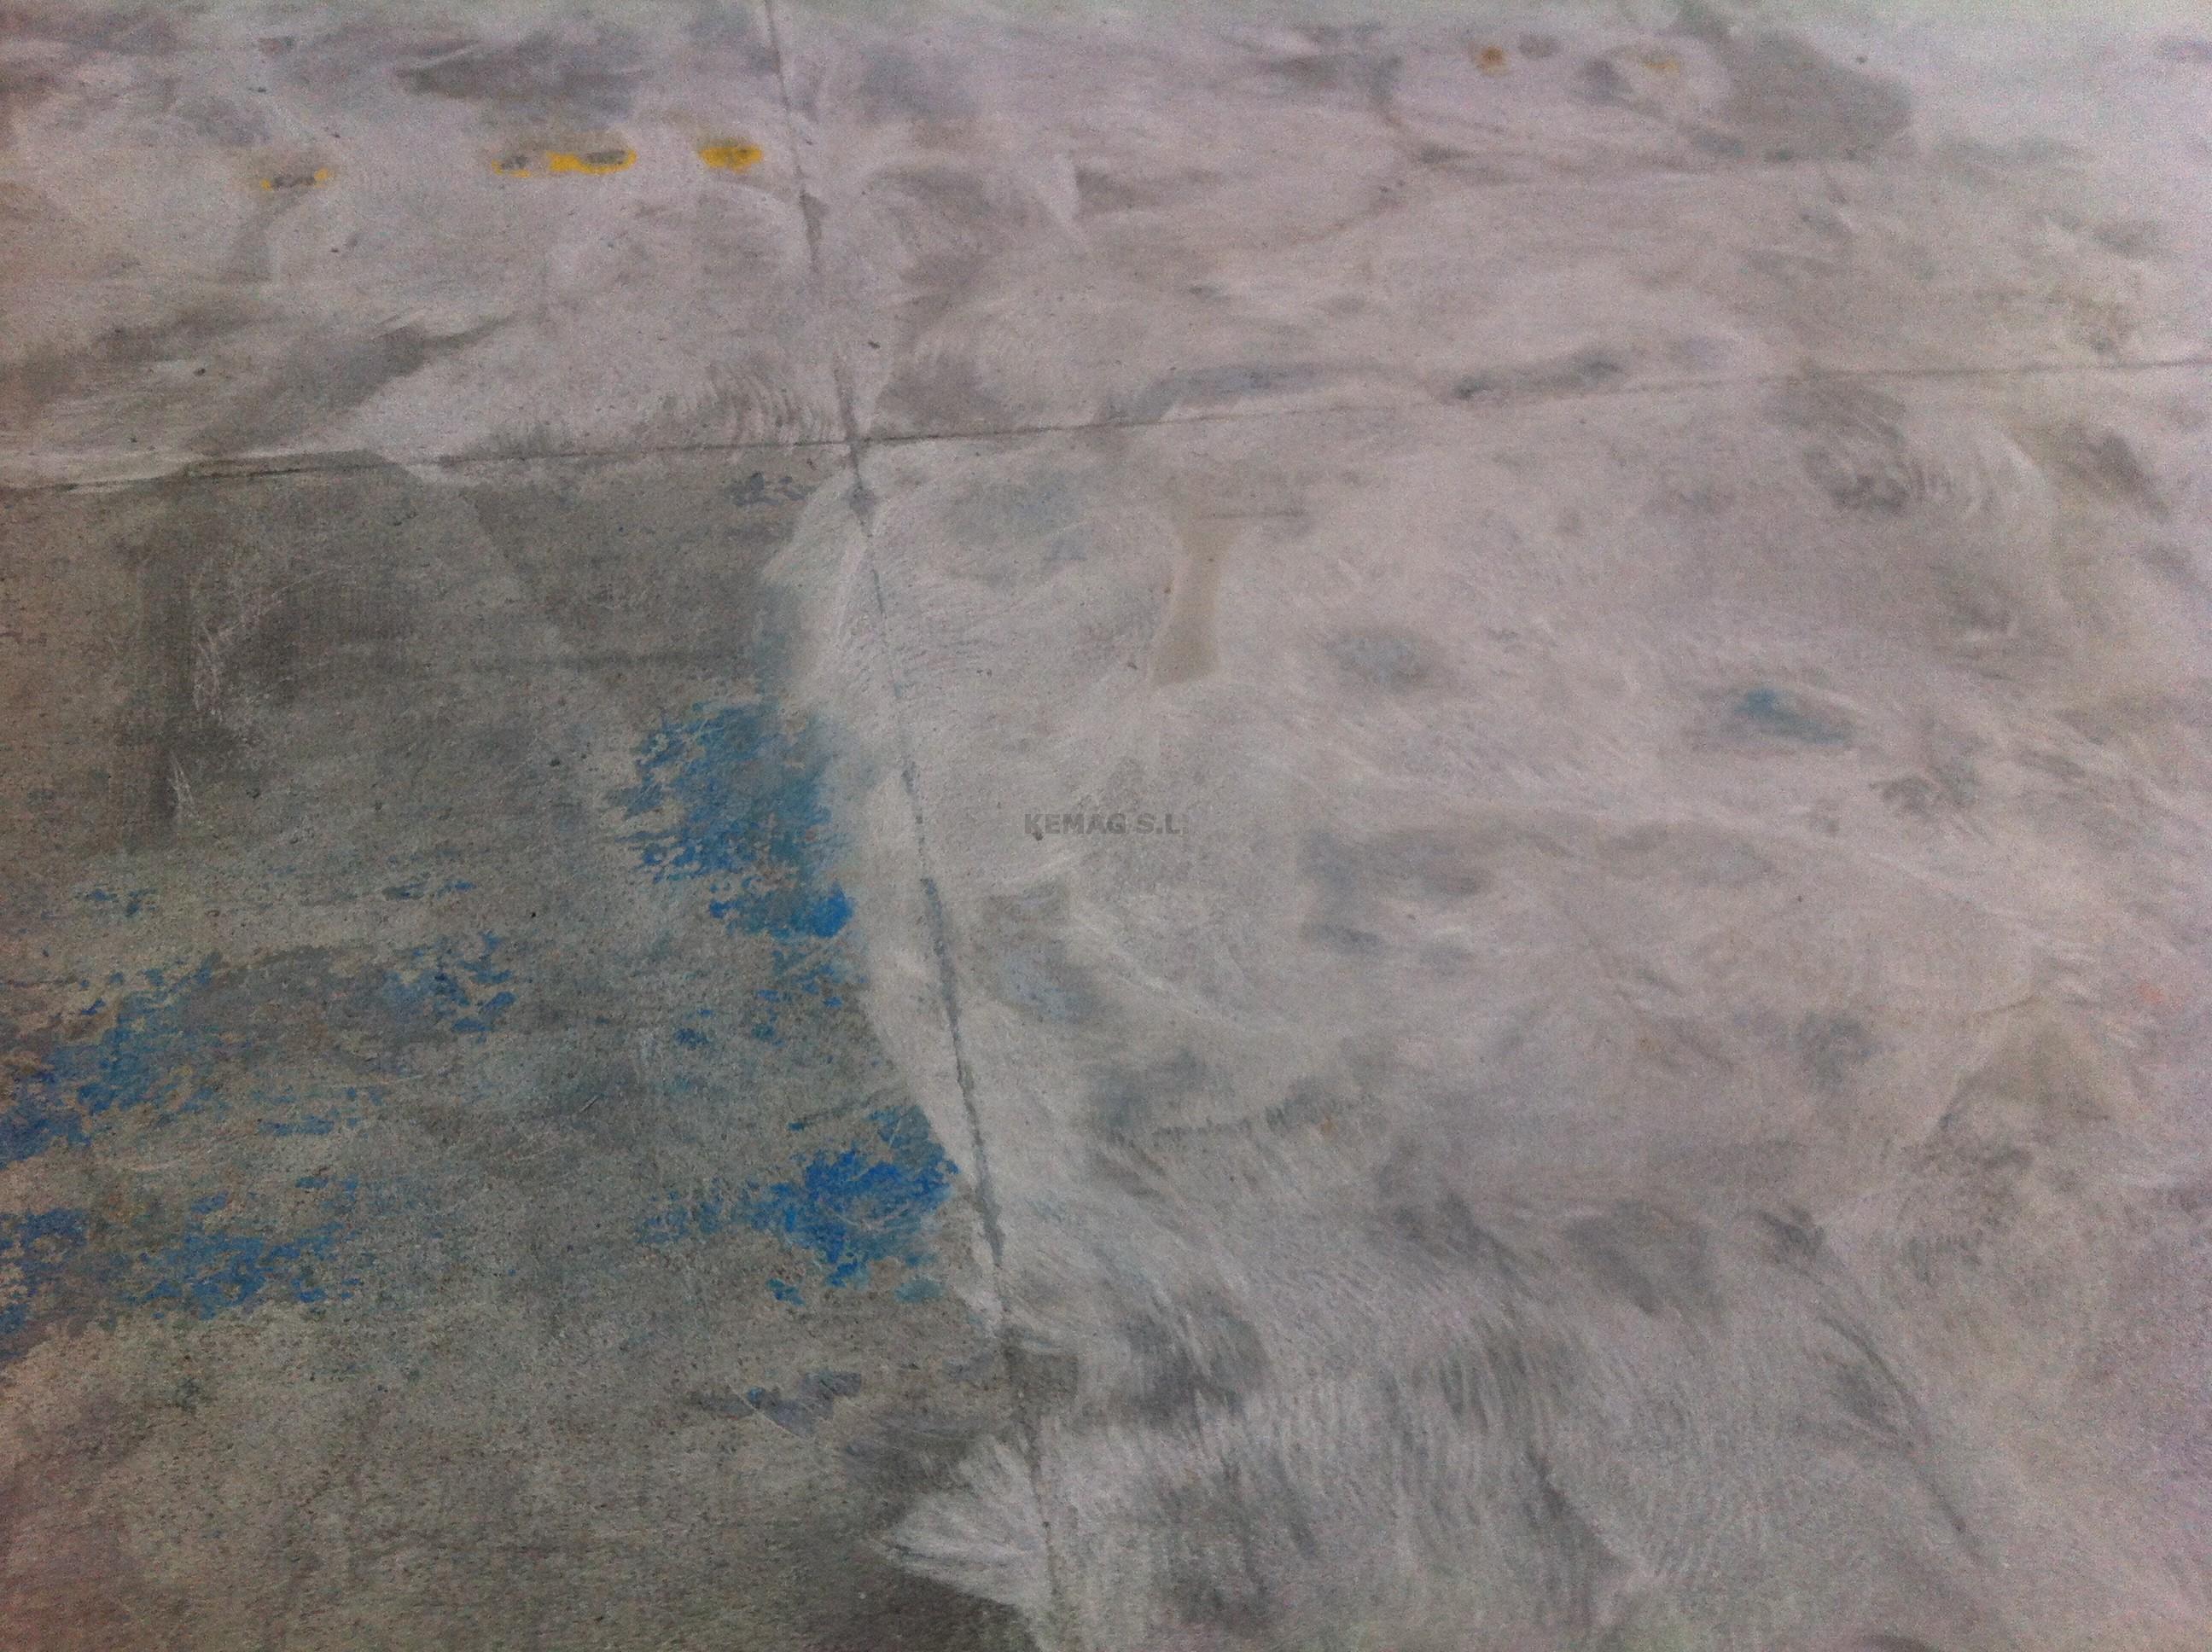 Prepararci n del suelo de microcemento kemag pavimentos - Como aplicar microcemento ...